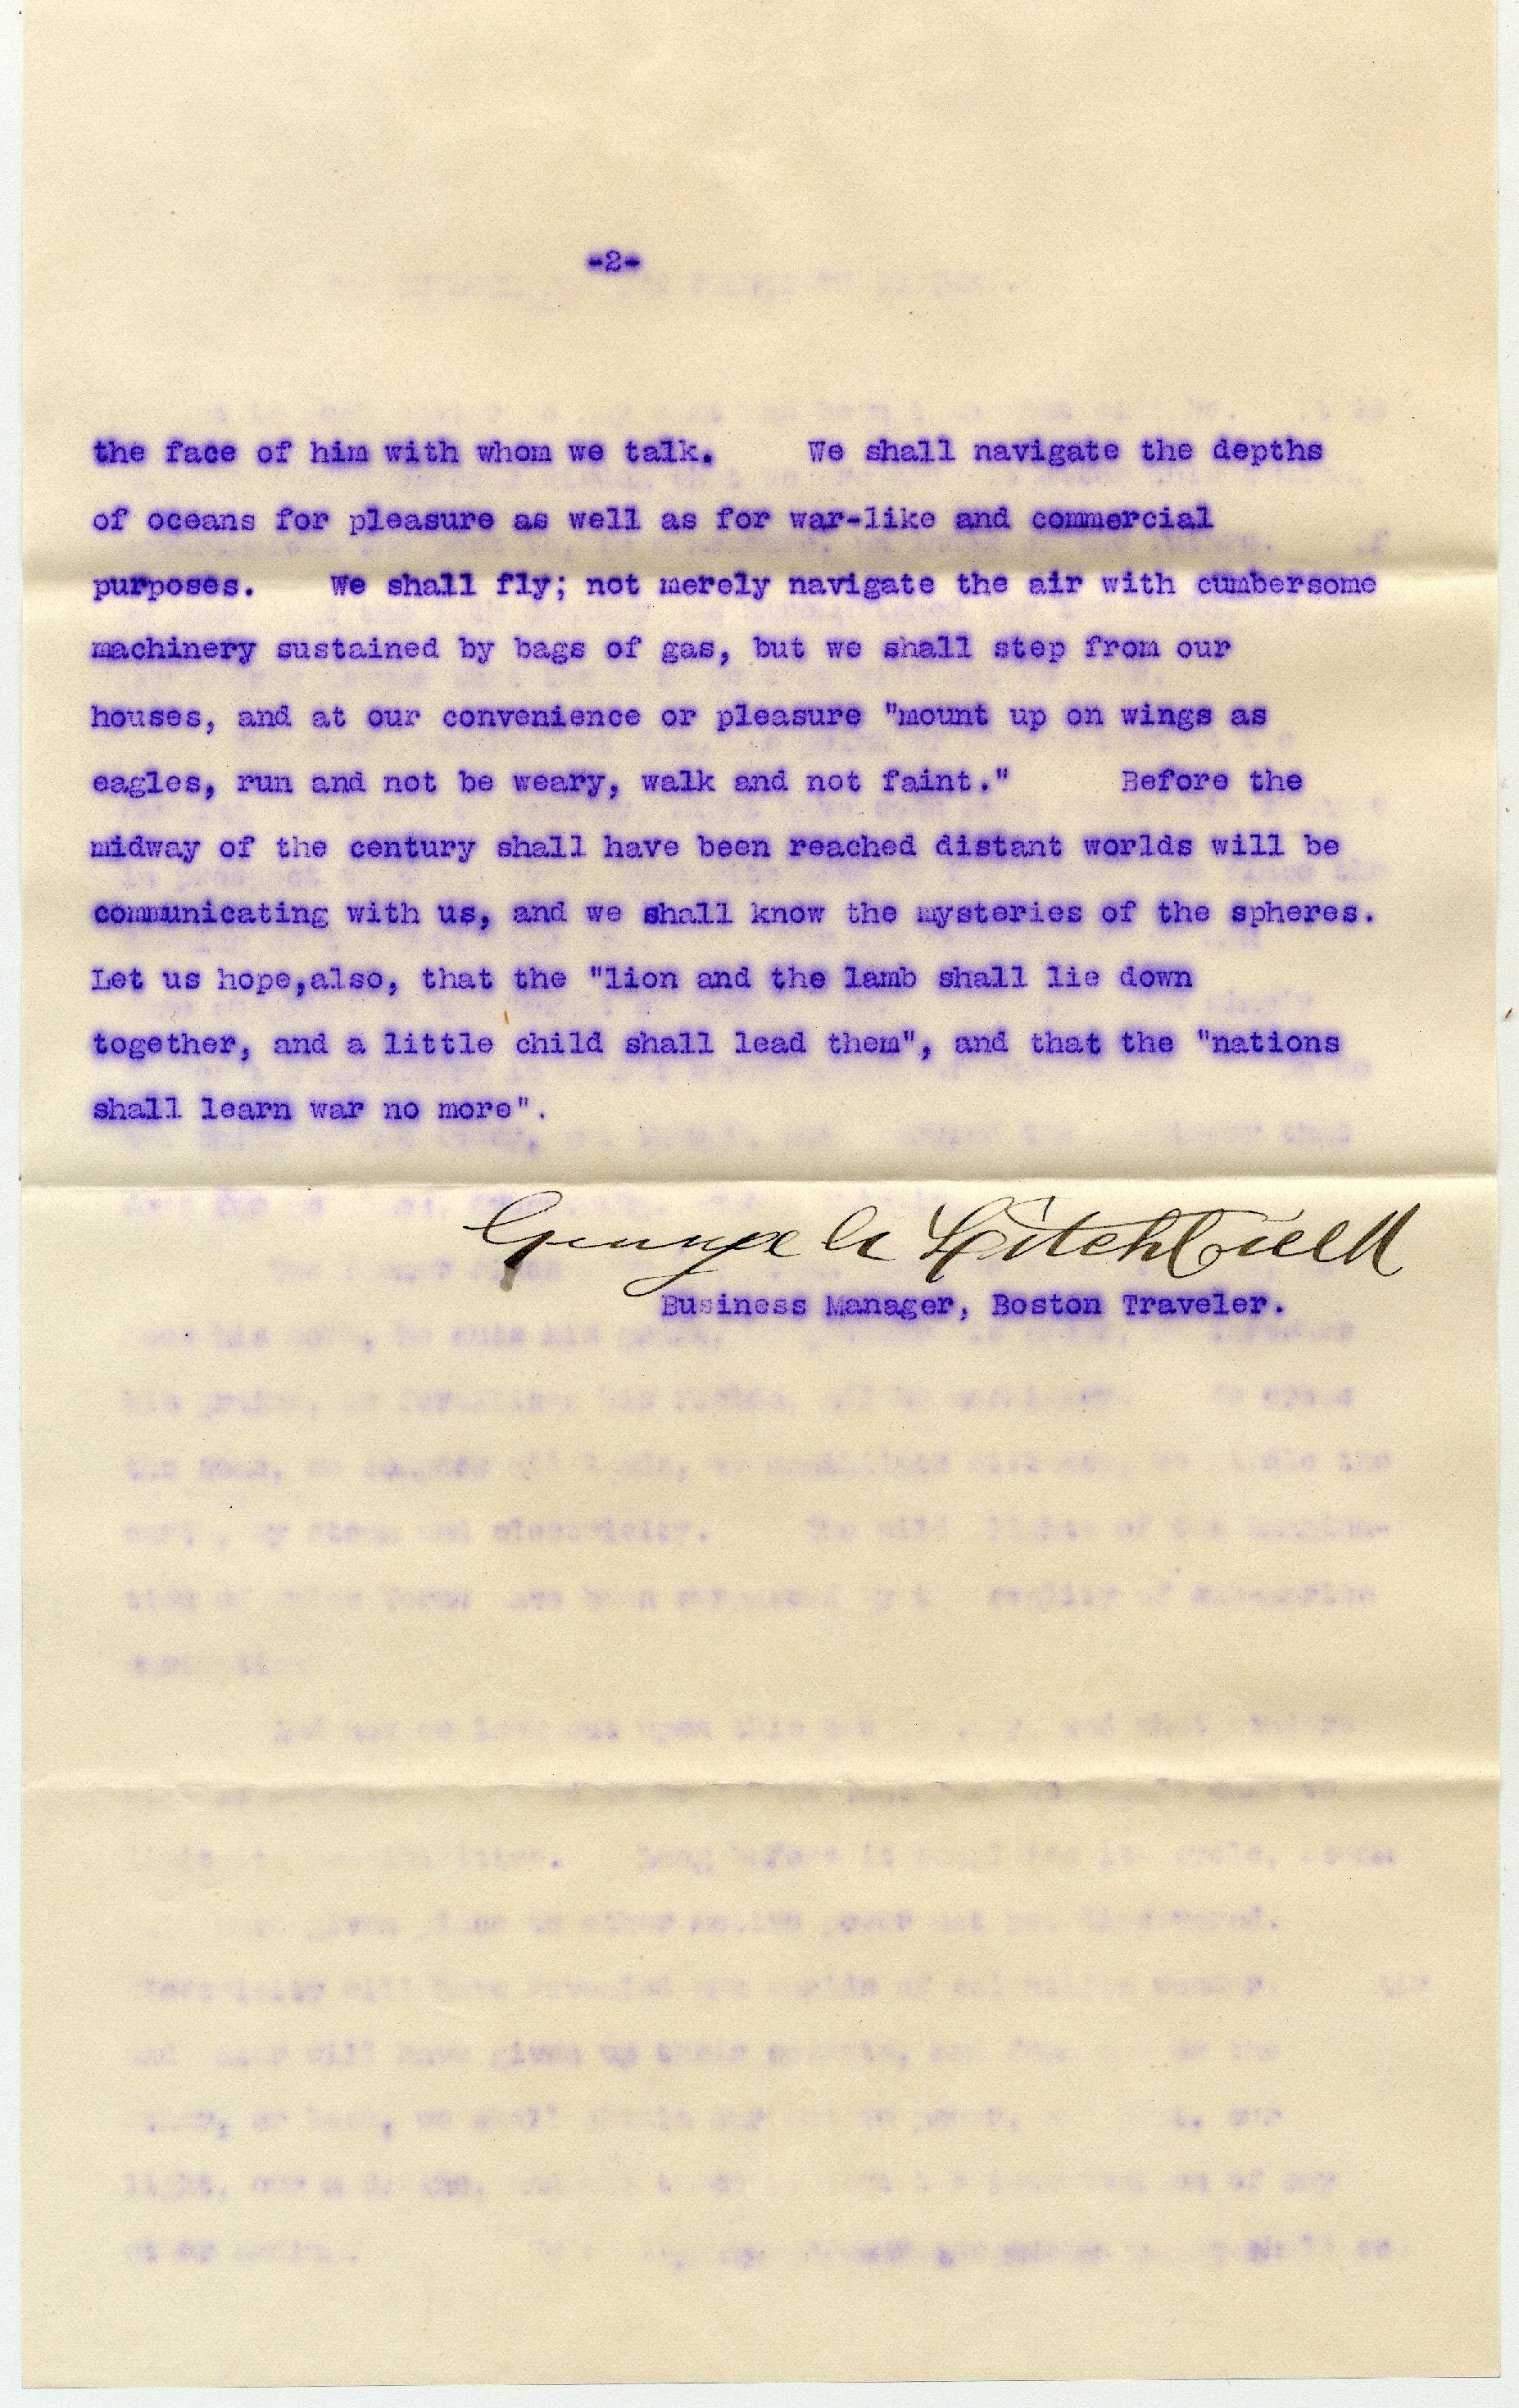 Boston Traveler letter page 2 copy